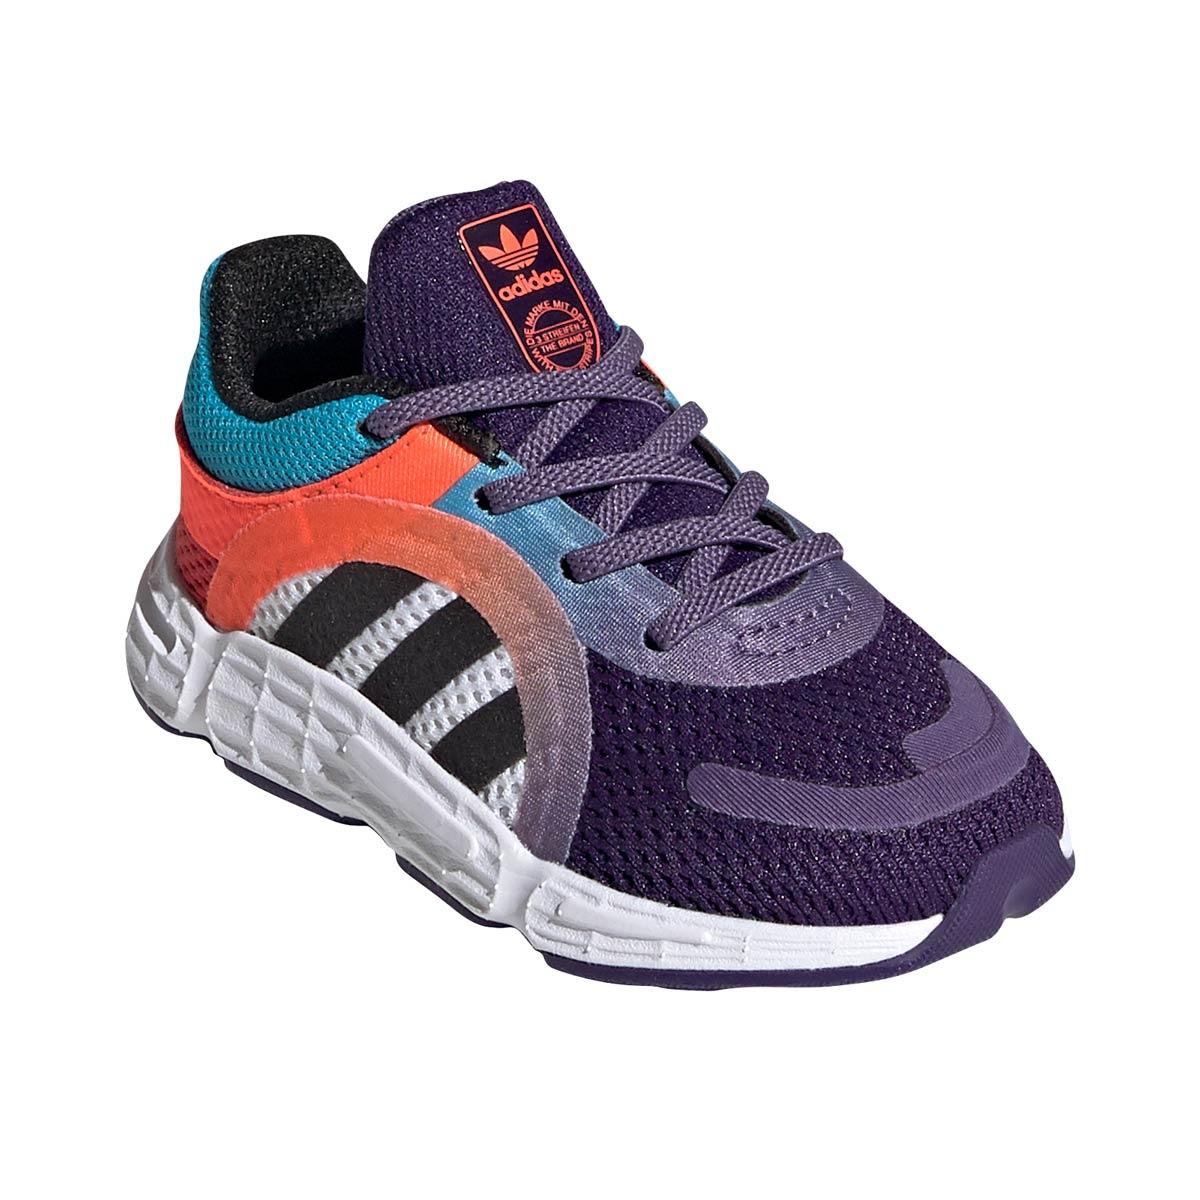 Tenis-Infantil-Adidas-Soko-C--20-ao-25-FW8046--4Q20-